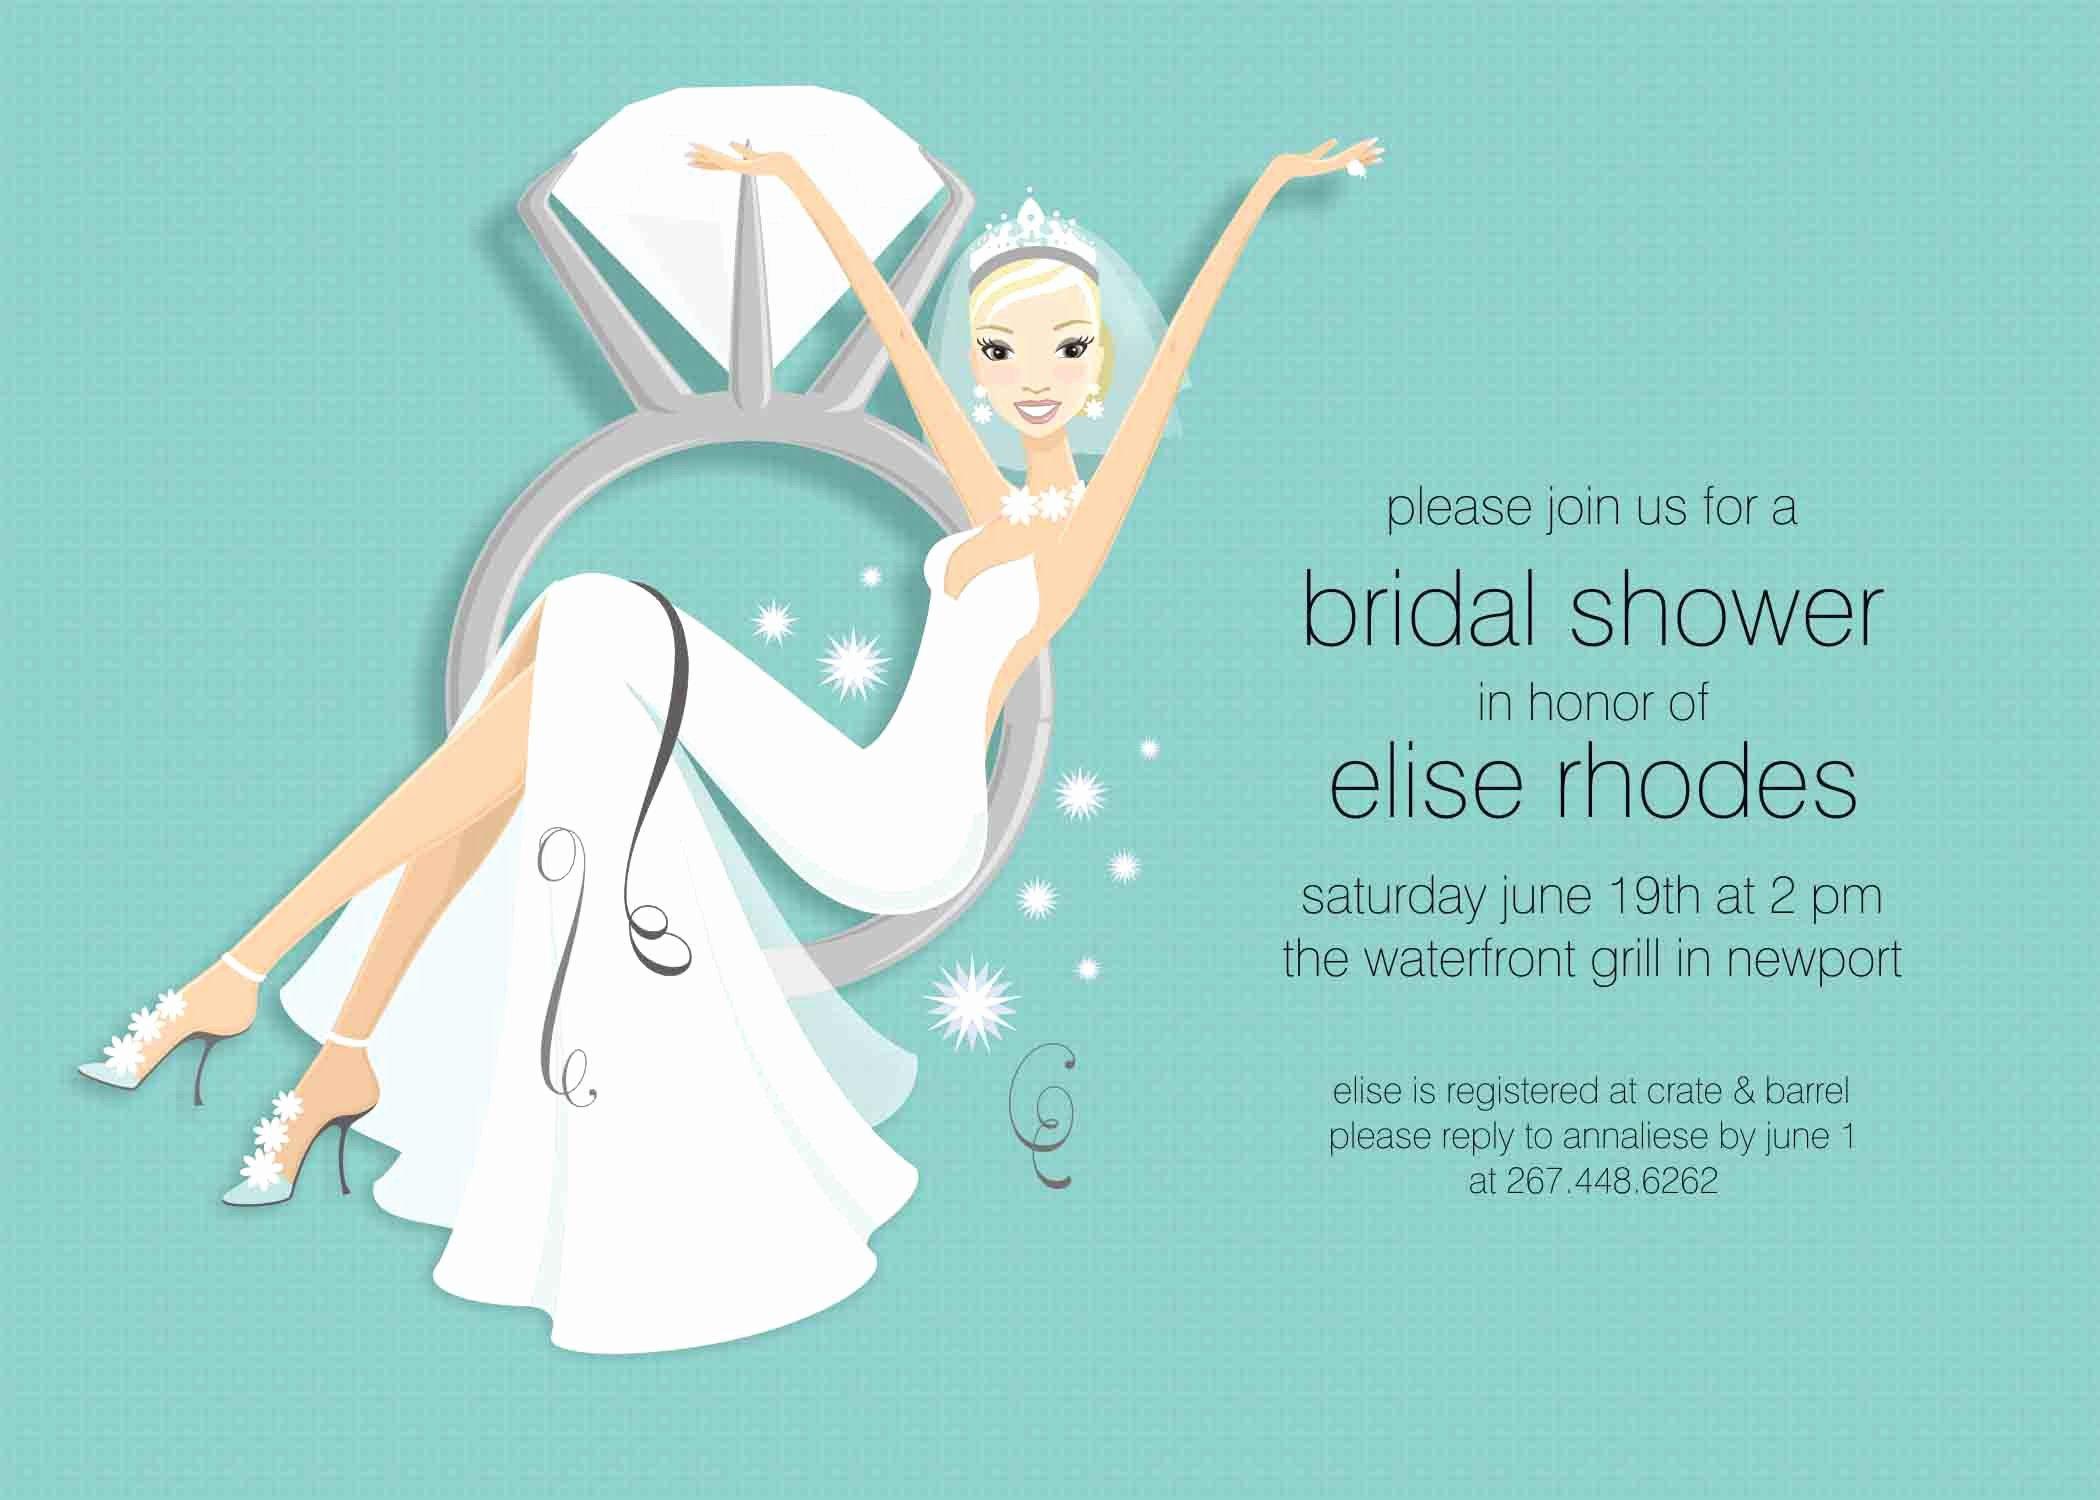 Bridal Shower Invitations Template Beautiful Baptism Invitation Christening Invitation Card Maker